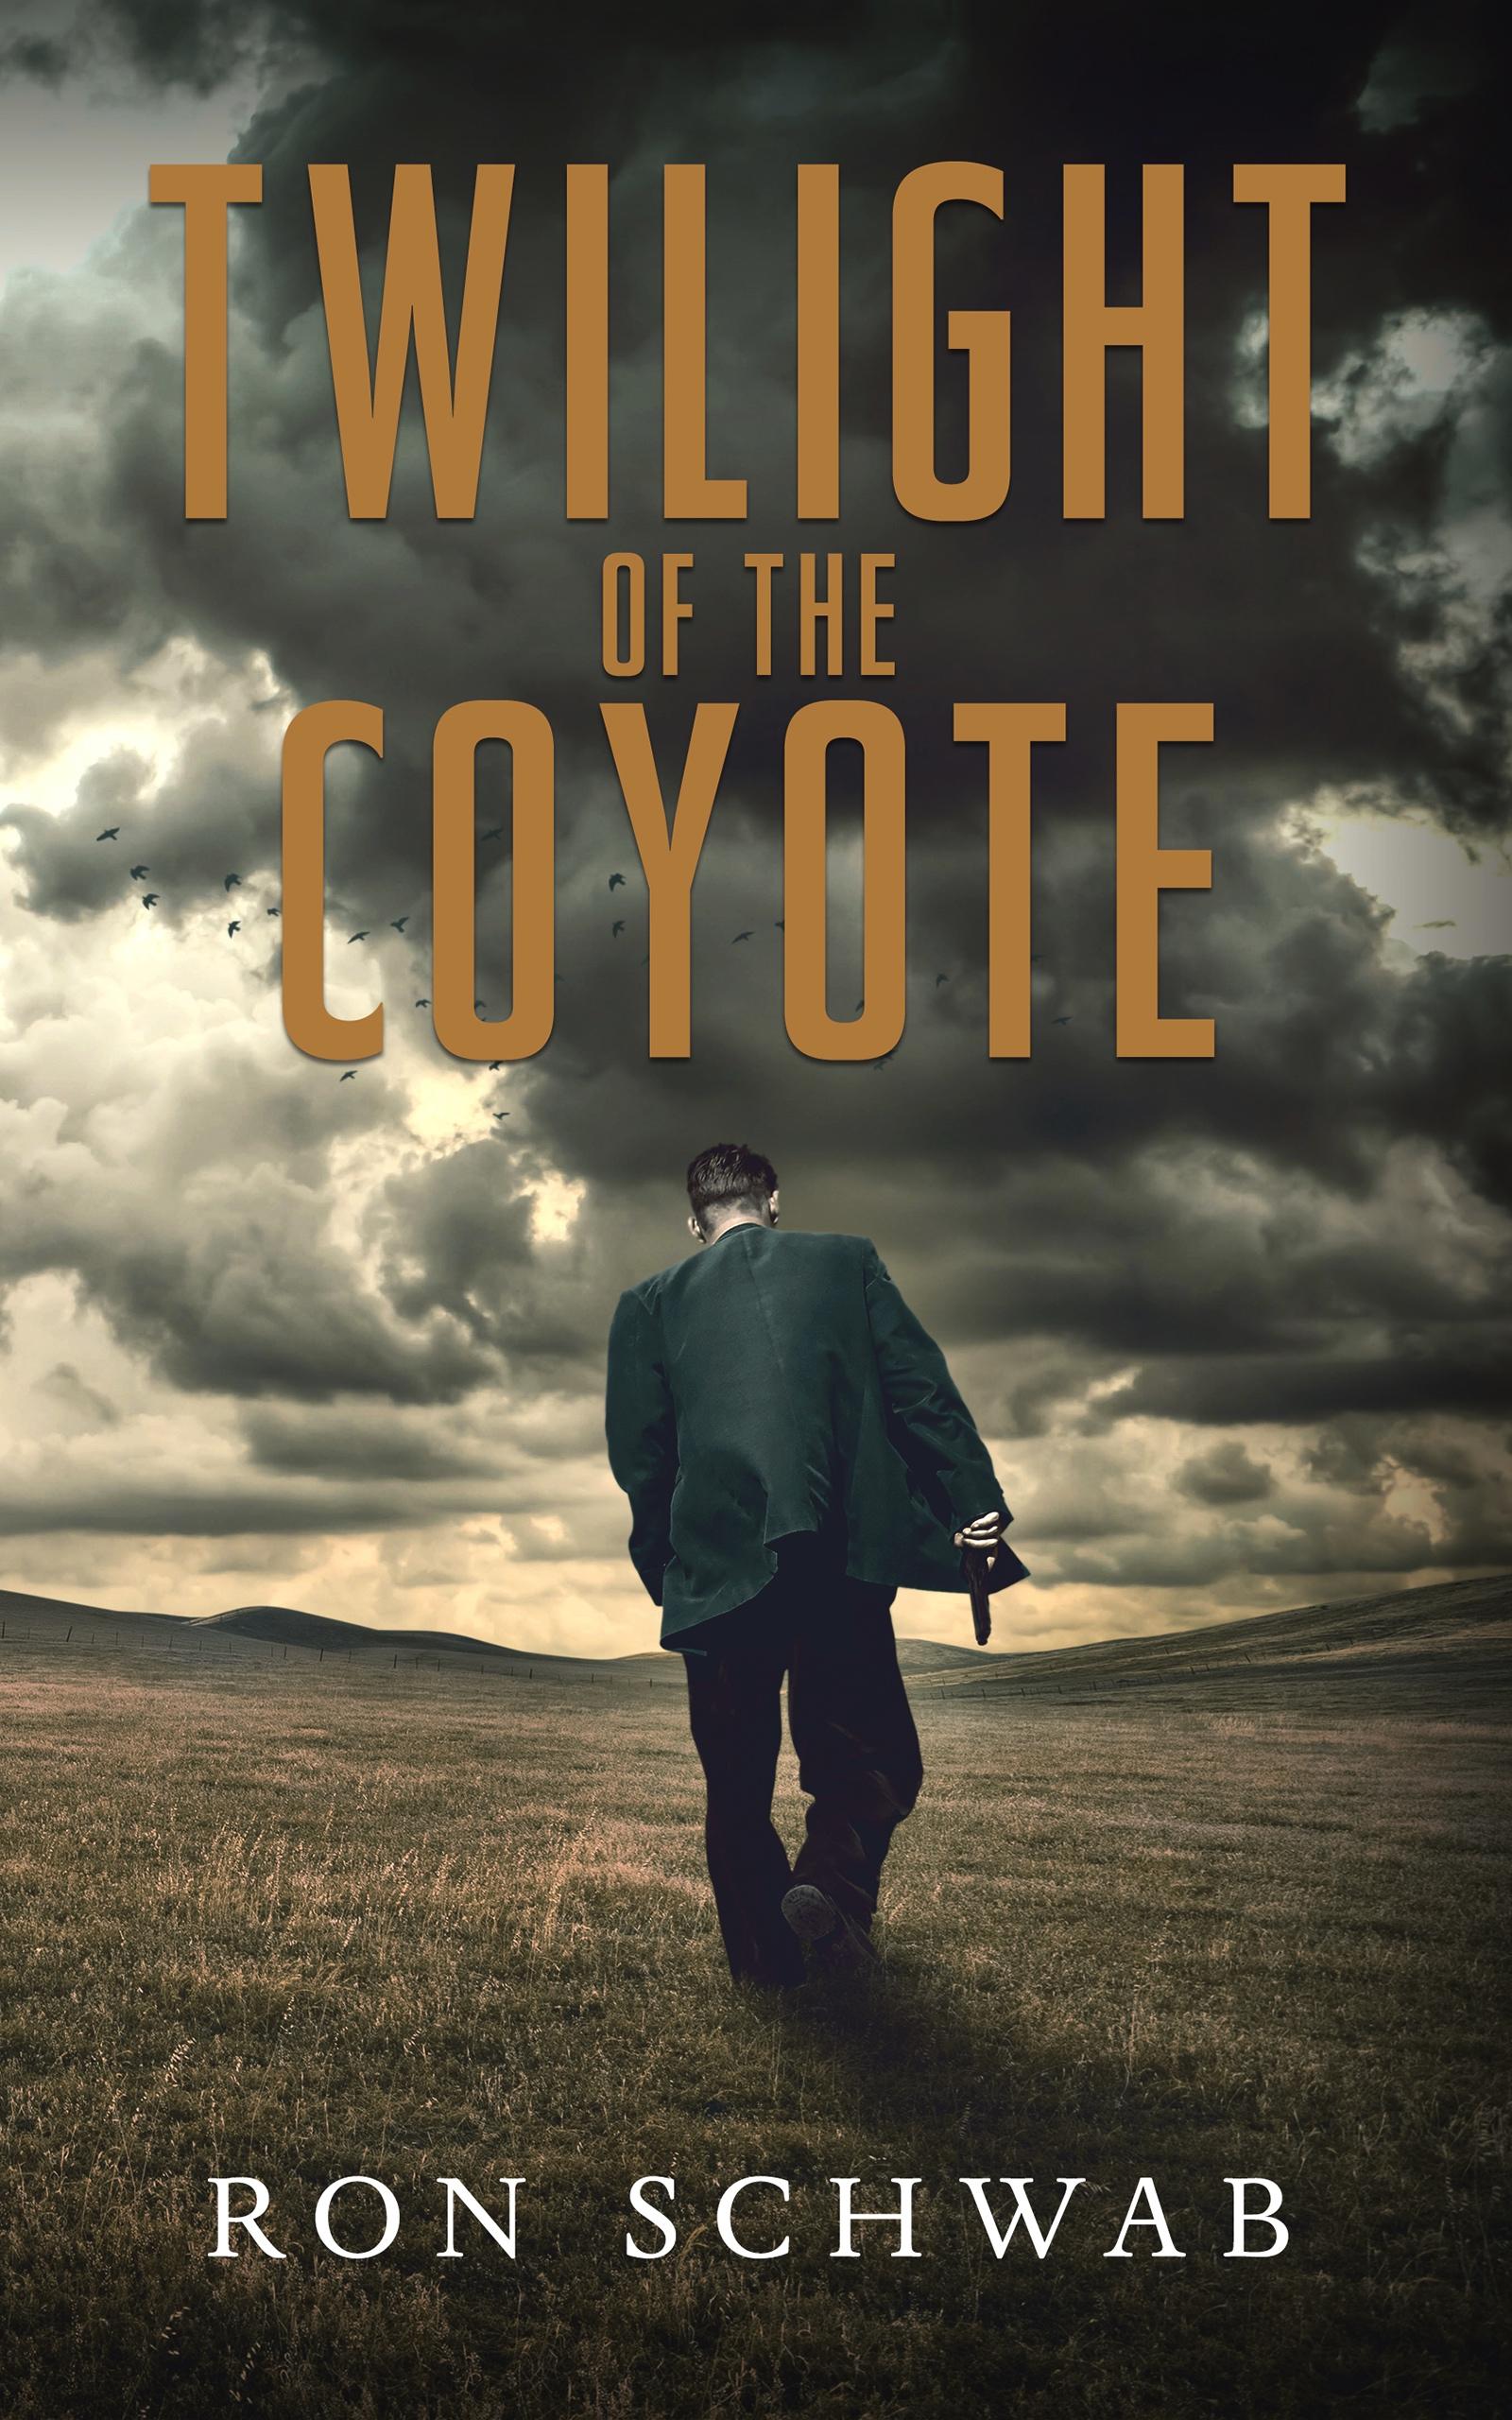 Twilight-of-the-Coyote-Kindle.jpg